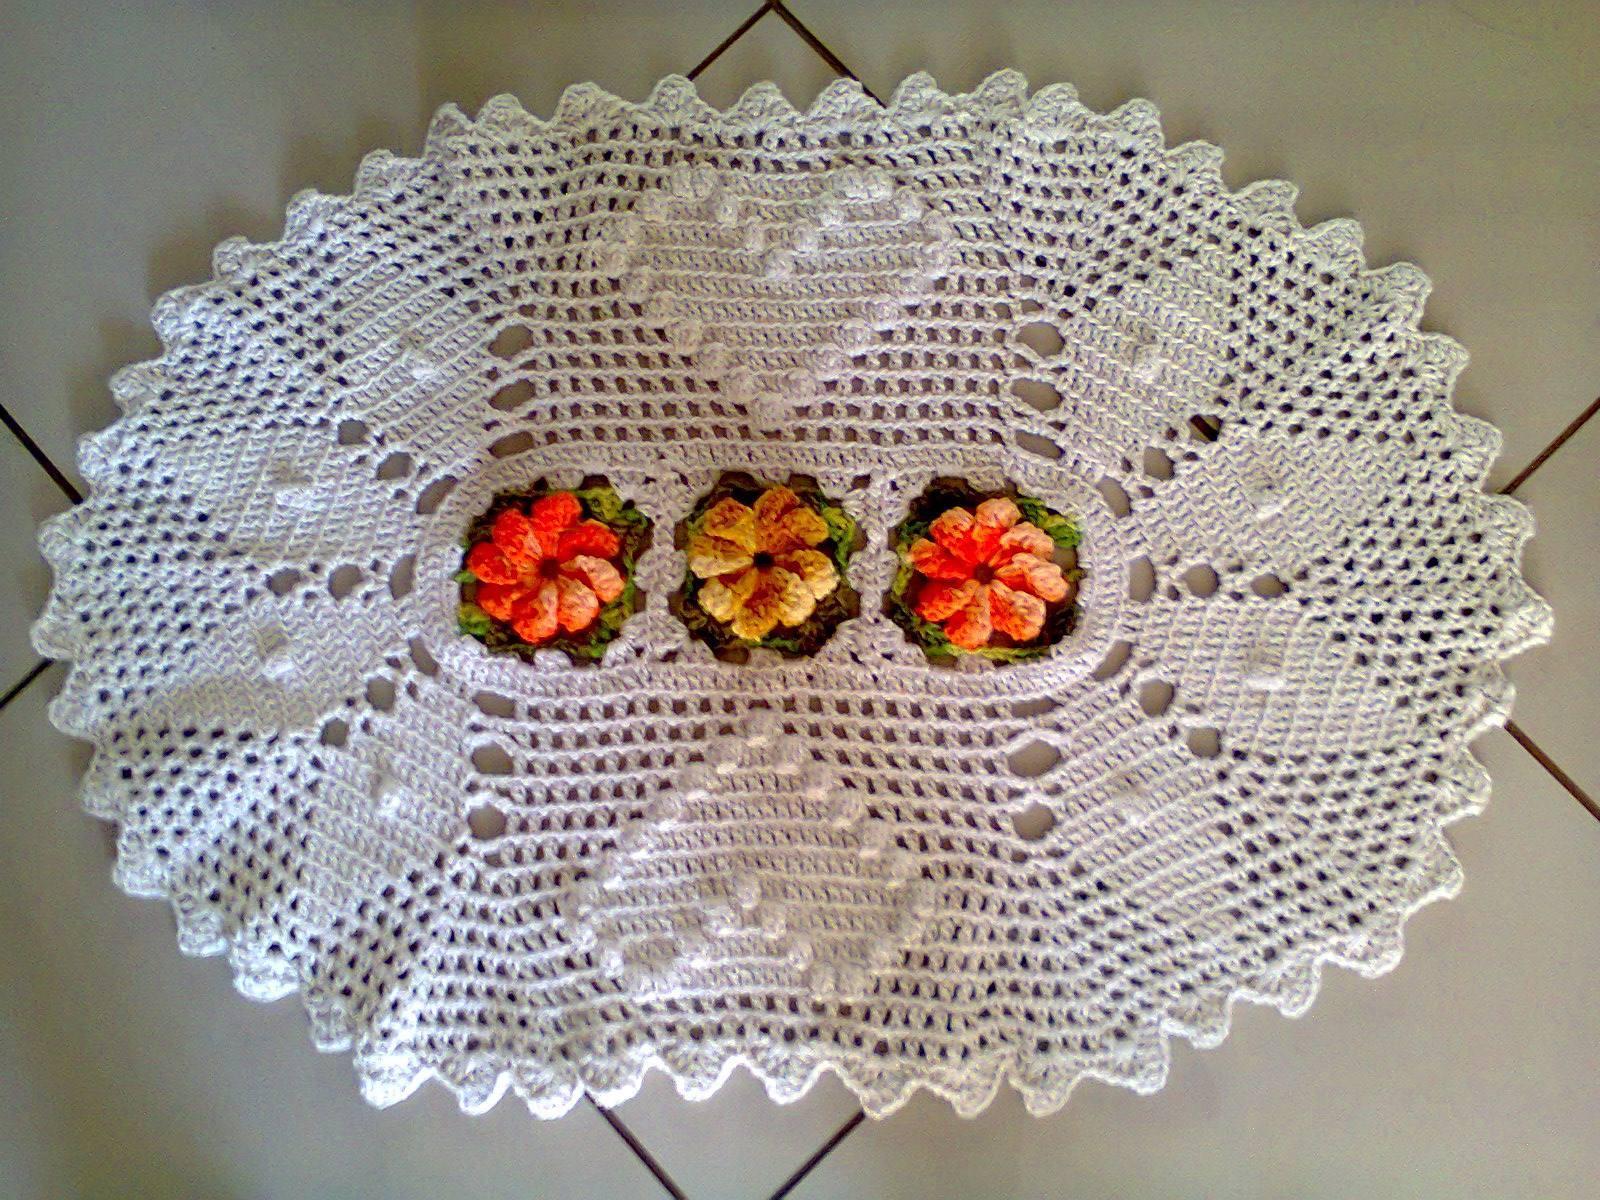 tapete de croche oval com flores car interior design. Black Bedroom Furniture Sets. Home Design Ideas